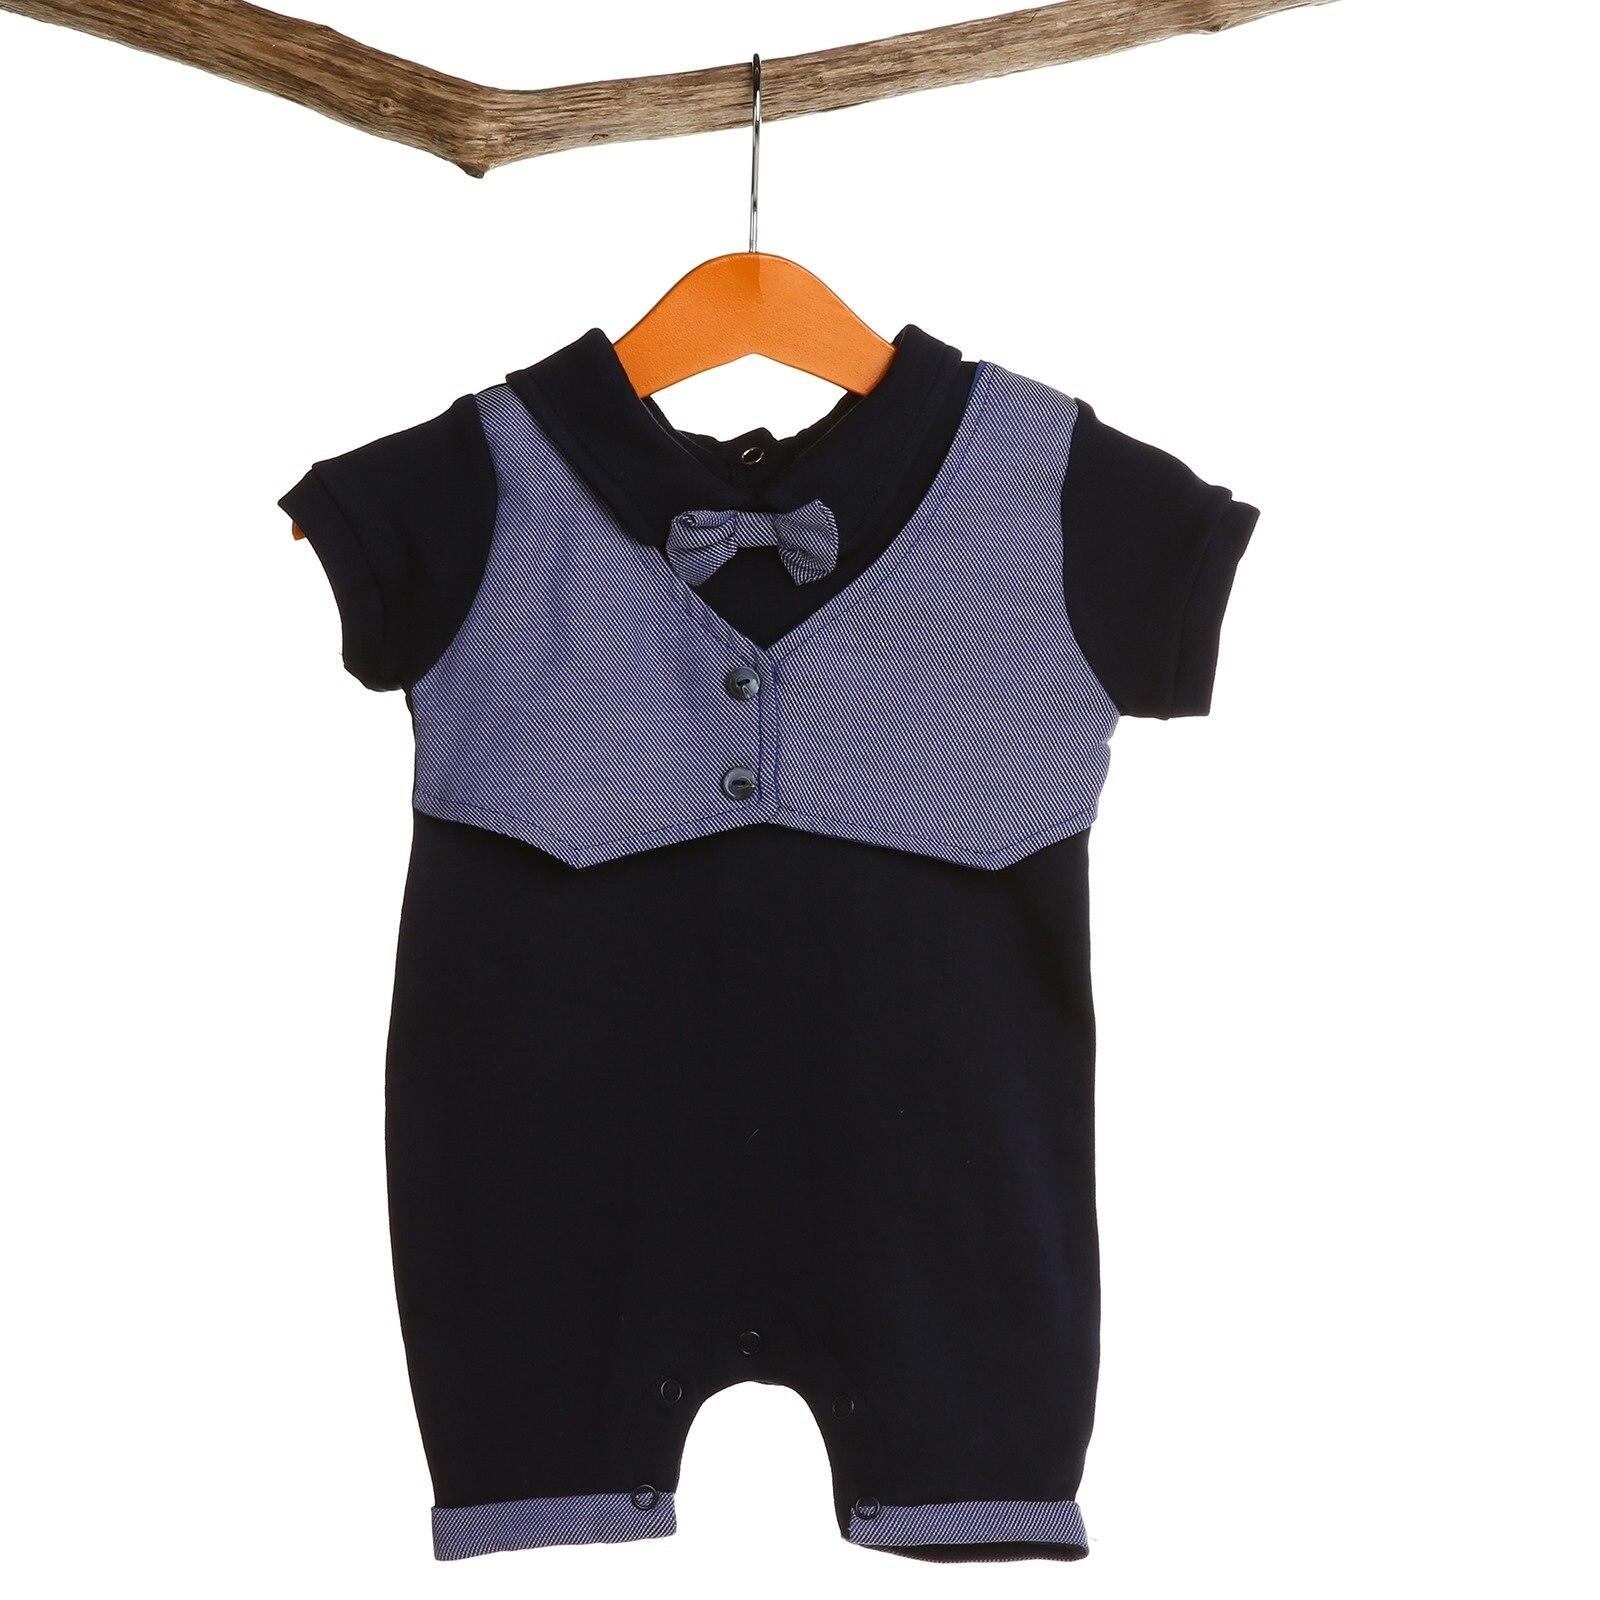 Ebebek Baby Corner Boy Special Day Romper